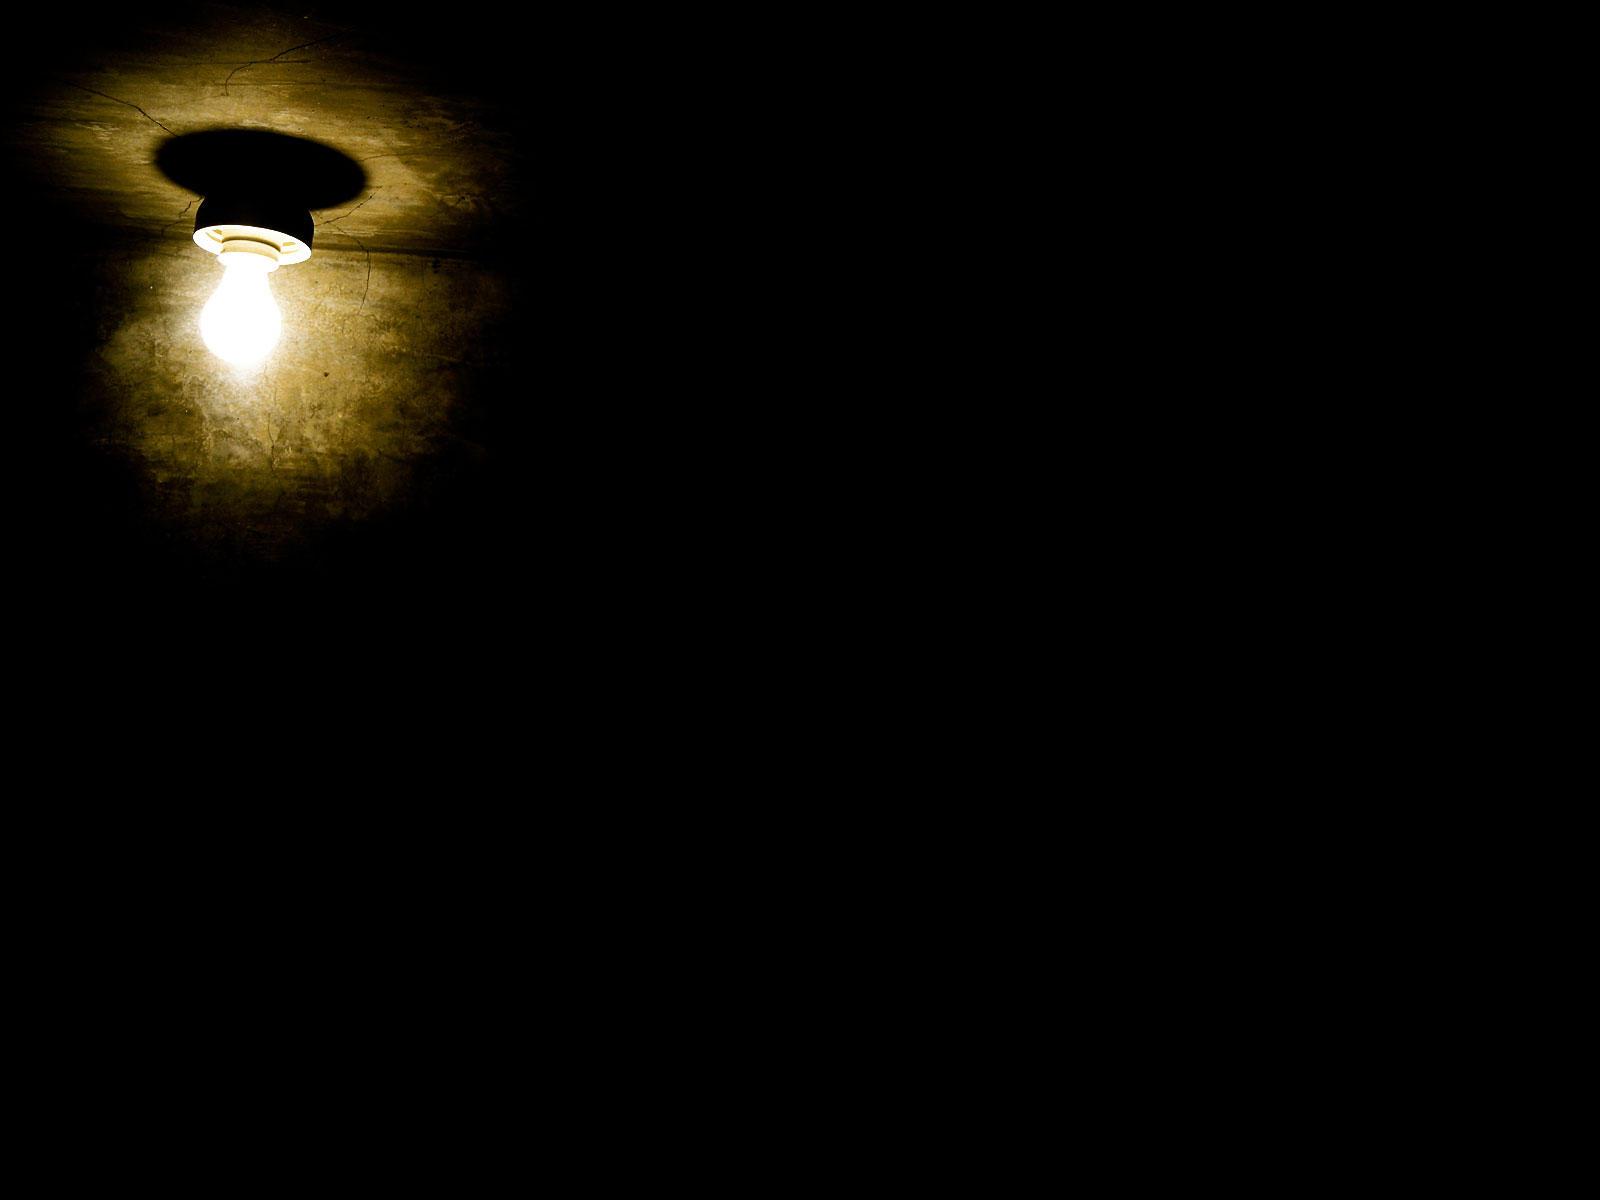 [Image: Little_lamp_in_dark_room.jpg]